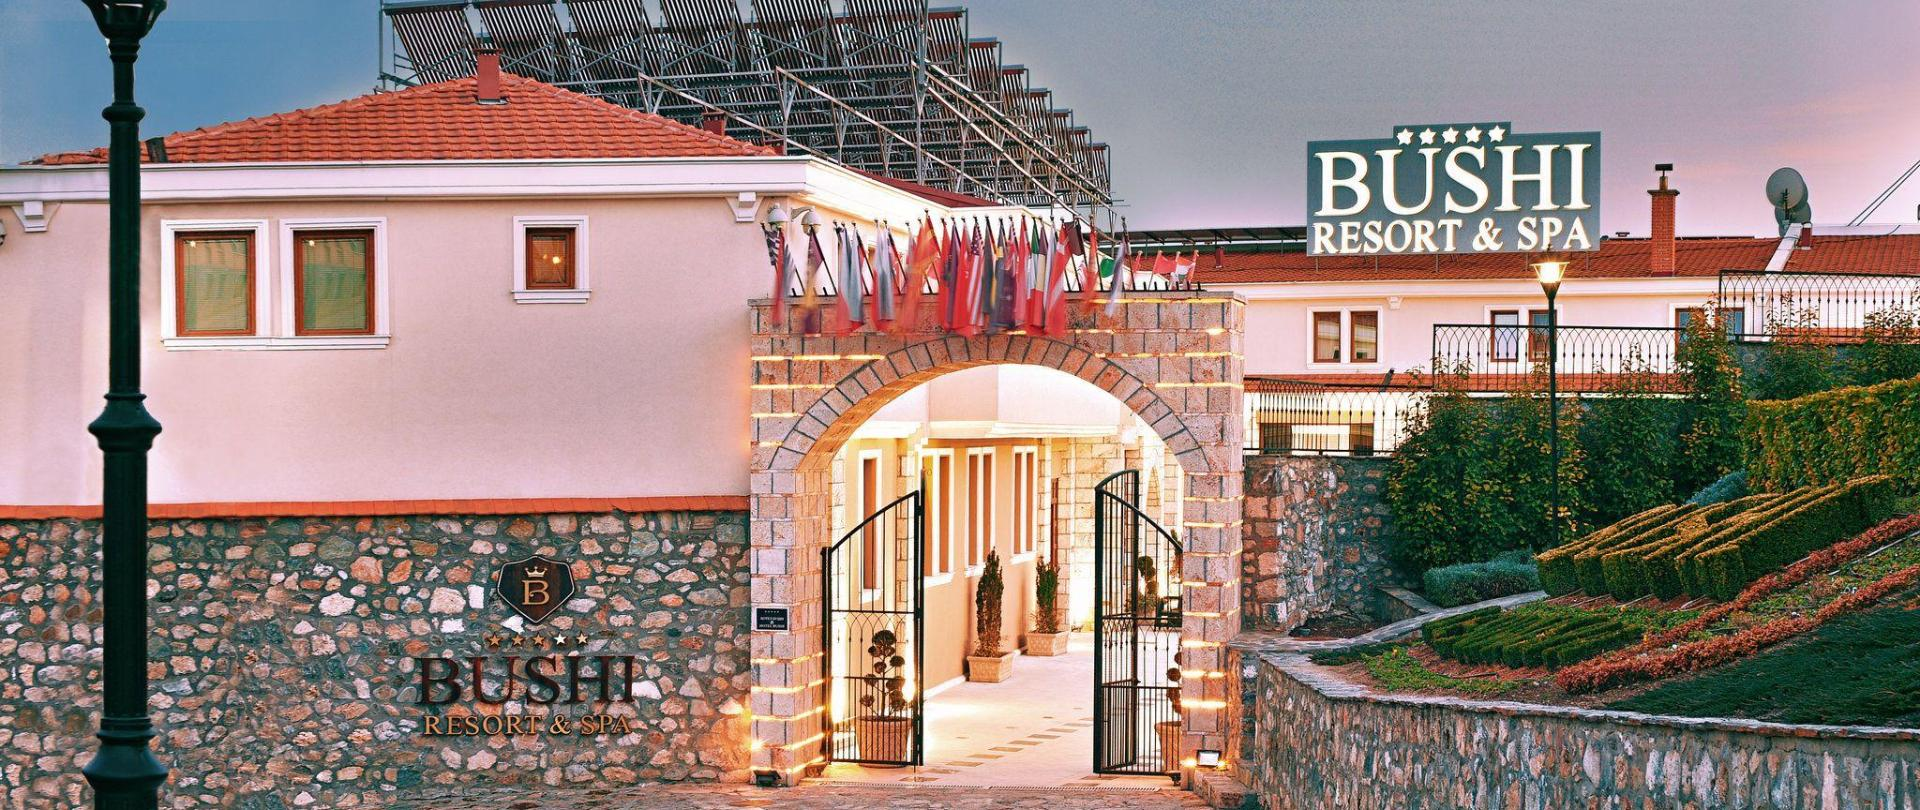 hotel_bushi_073-1_1-2.jpg